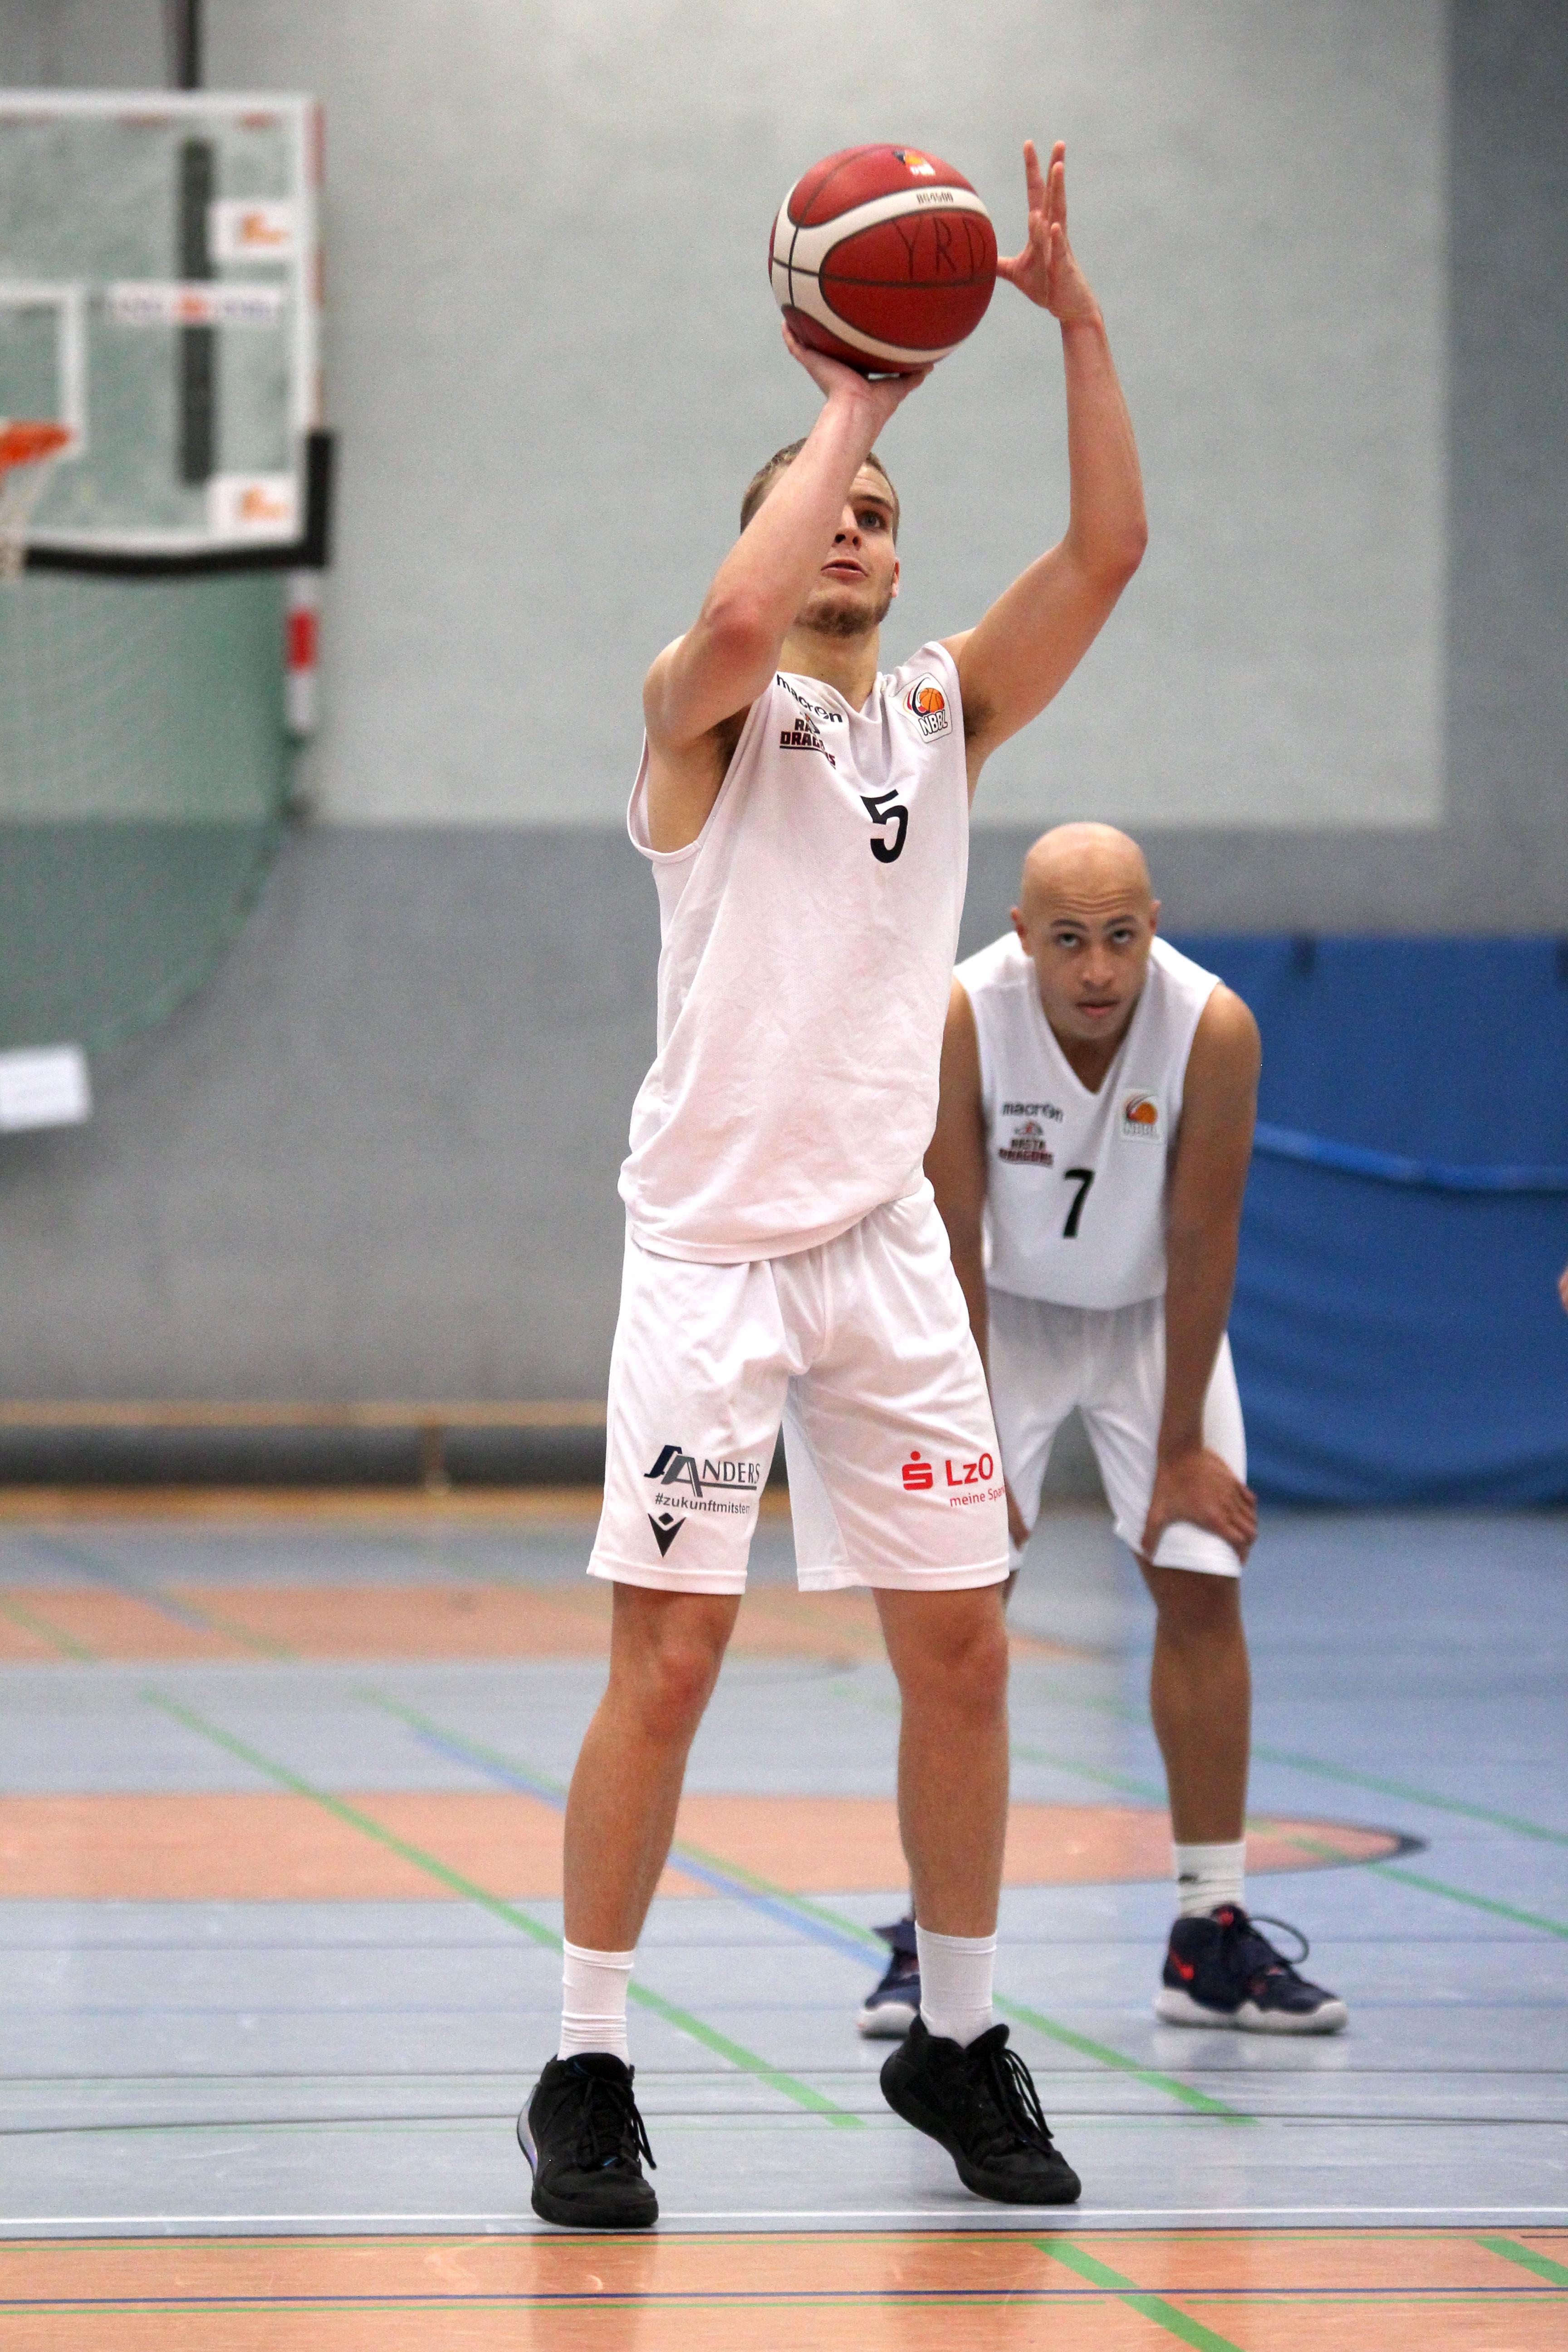 NBBL_20-21_YOUNG-RASTA-DRAGONS_Münster_Spieltag1_Torge-Buthmann_21